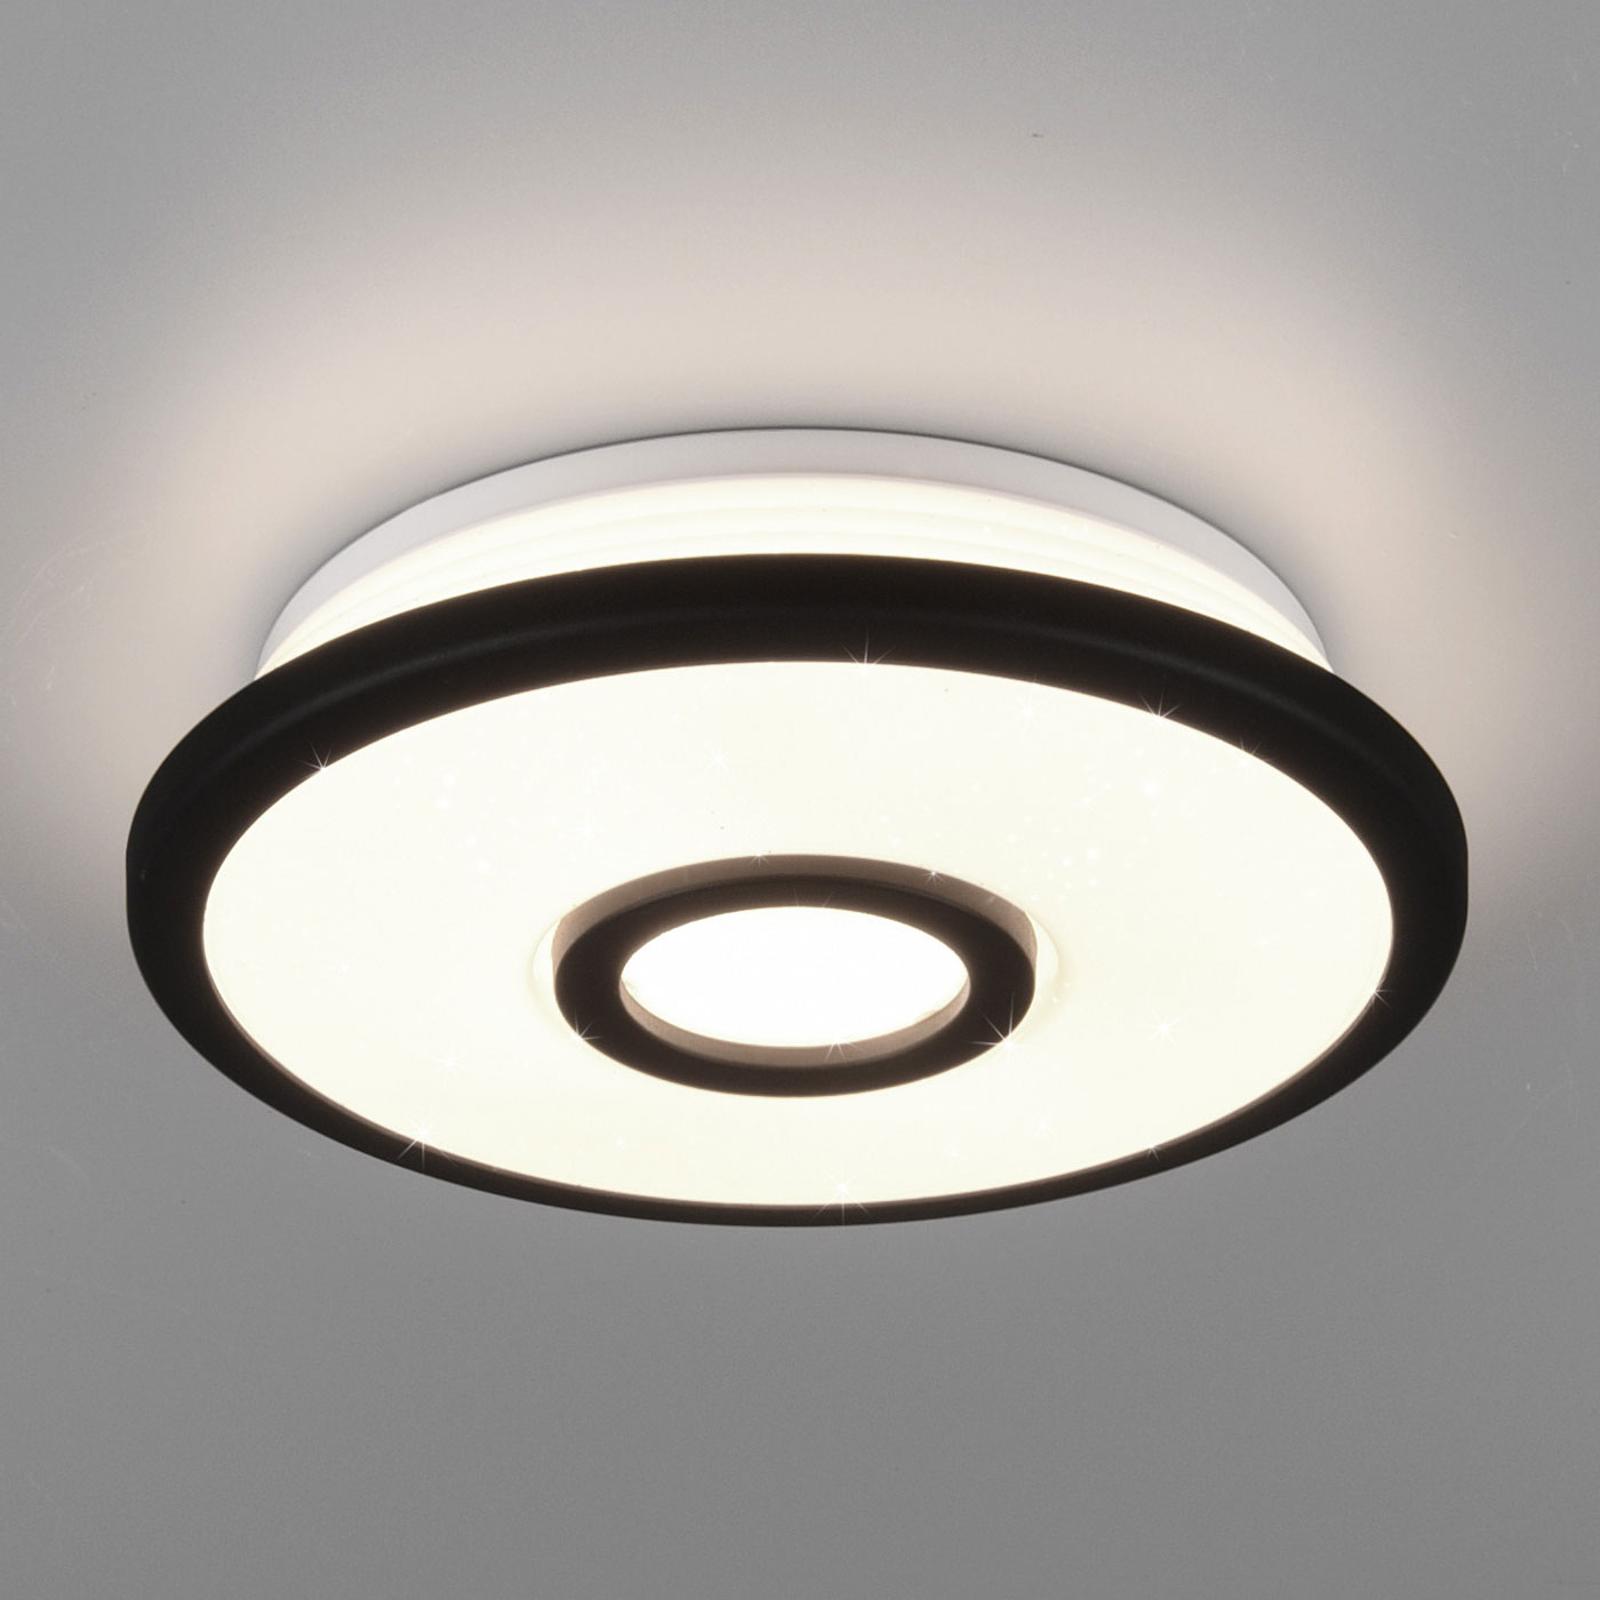 LED-kattovalo Okinawa, Starlight-efekti, Ø 21 cm